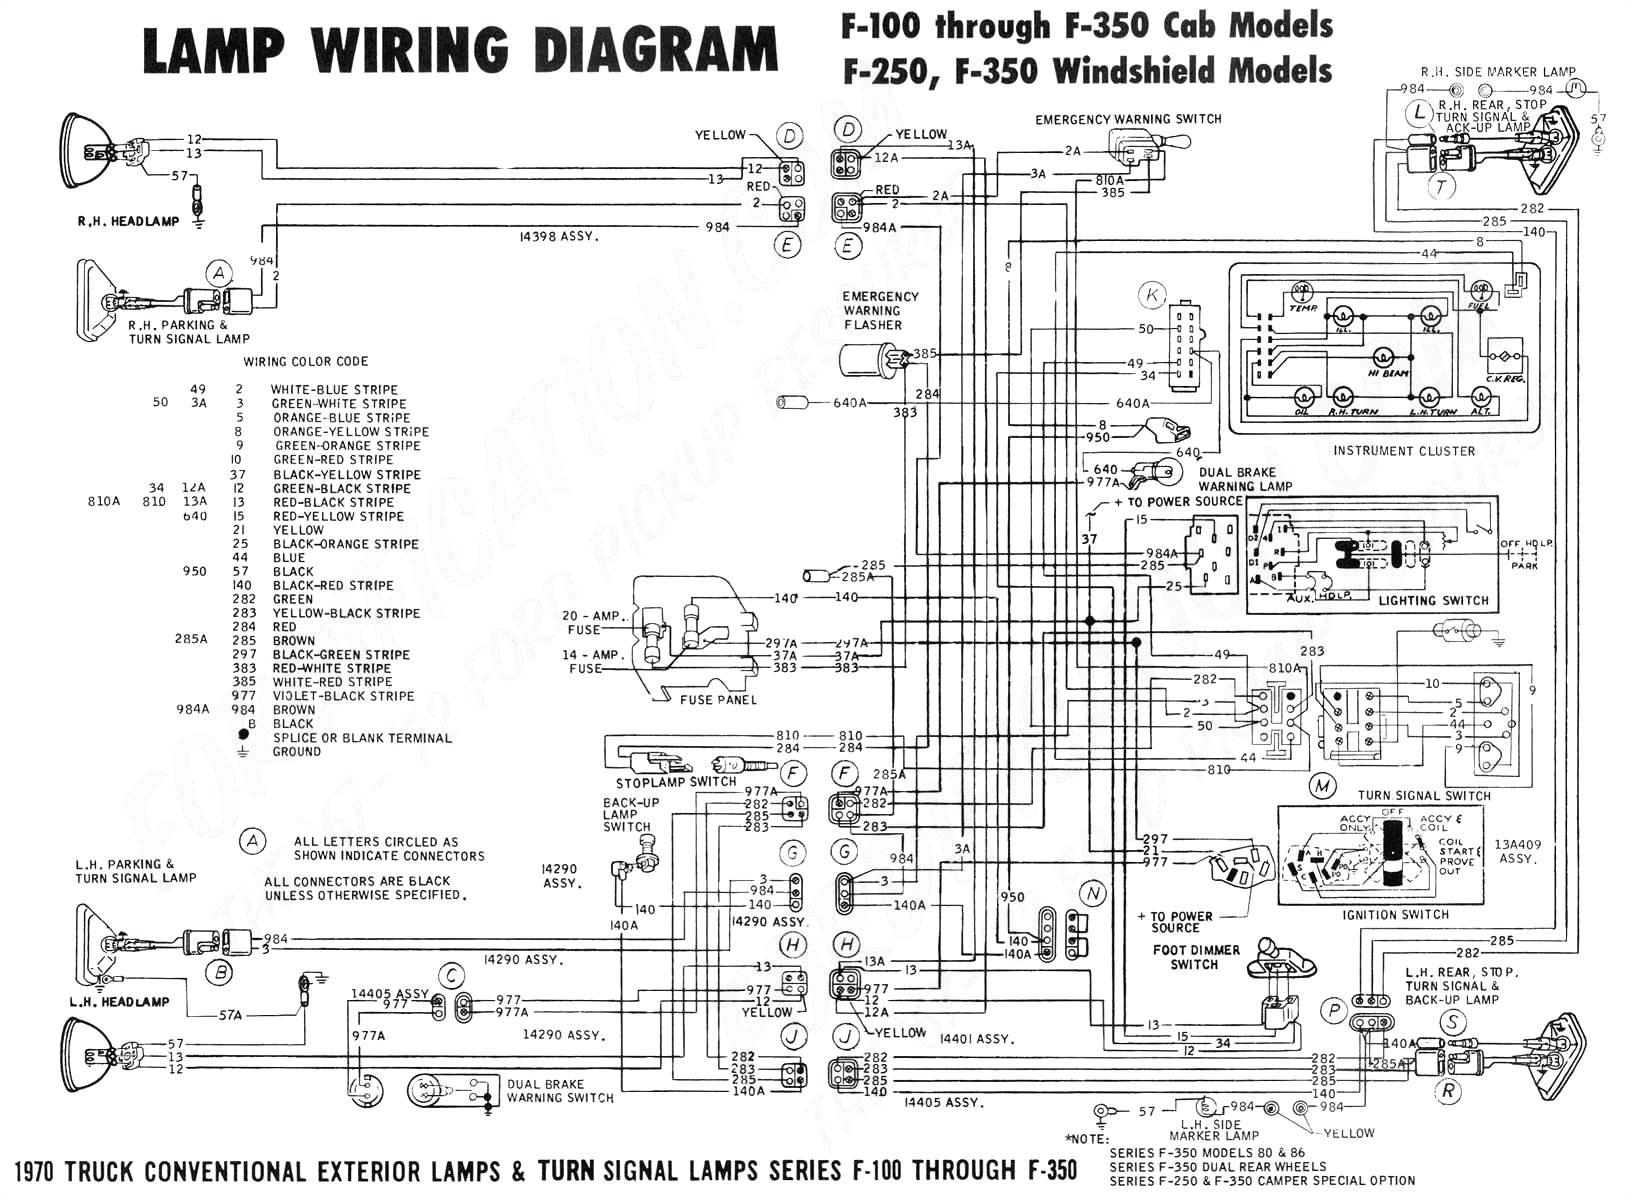 2002 pt cruiser radiator fan wiring diagram luxury az diagram 2002 jpg